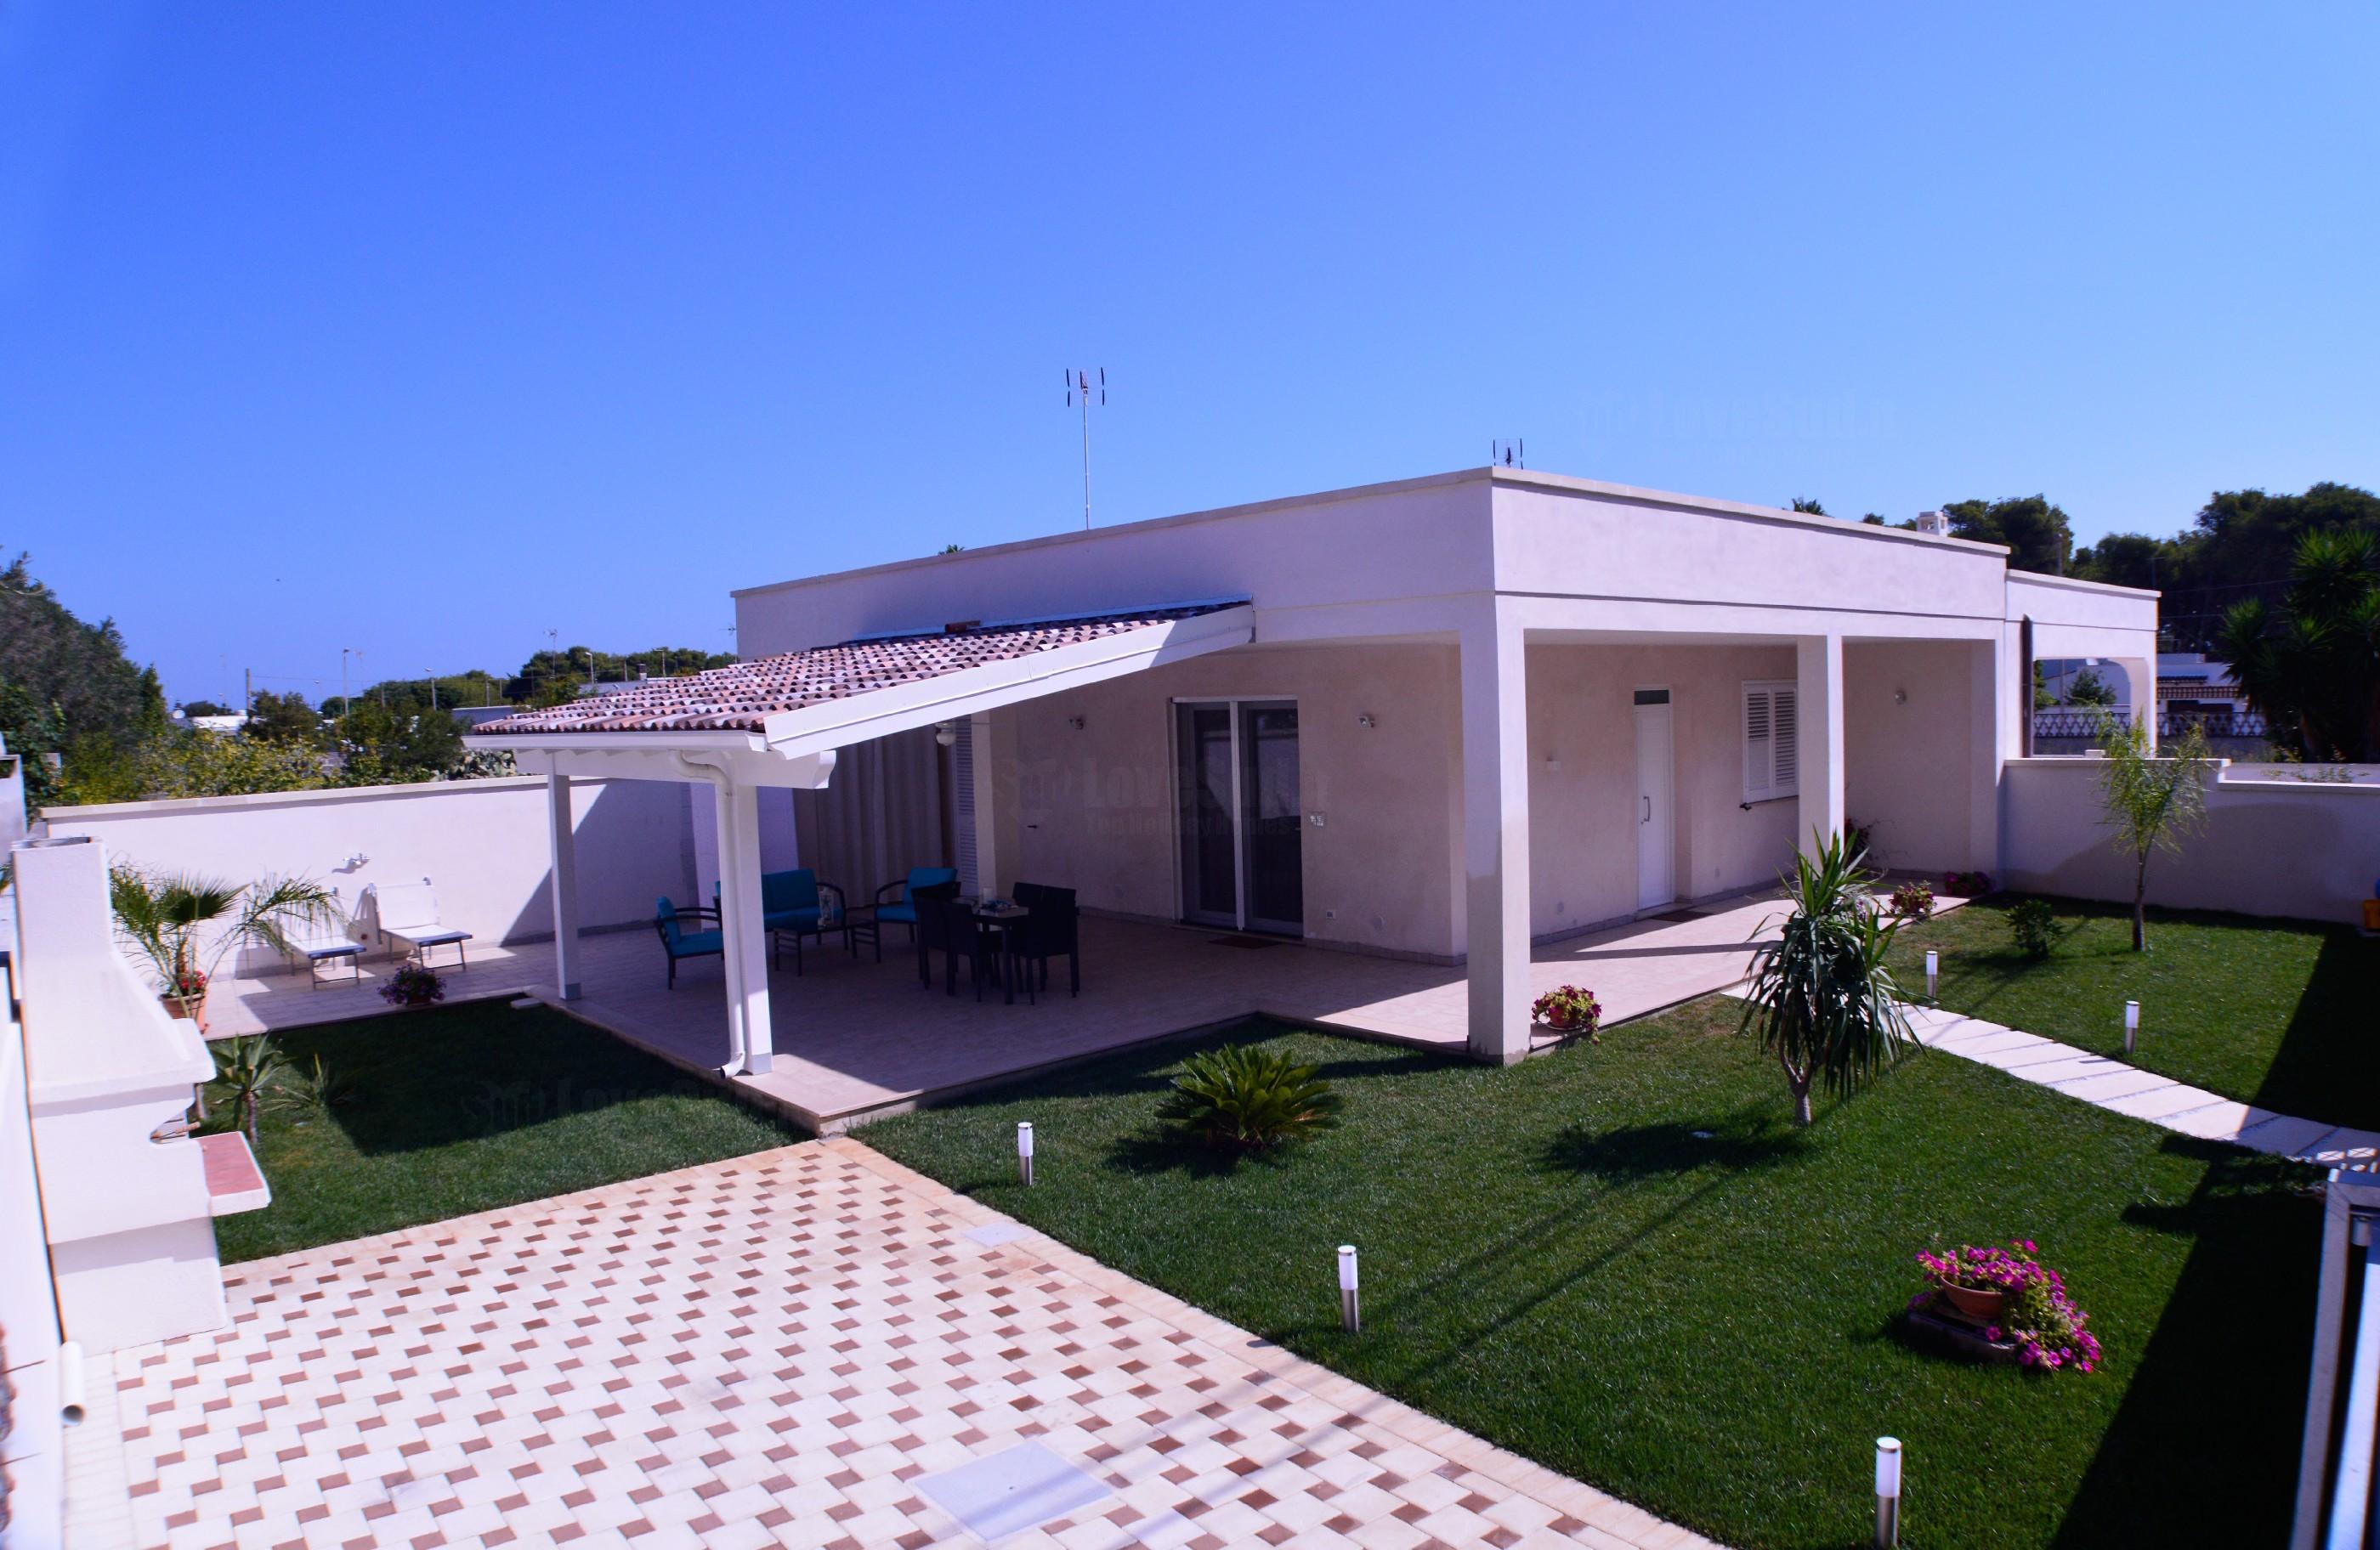 Elcisia luxe beach house photo 20260779